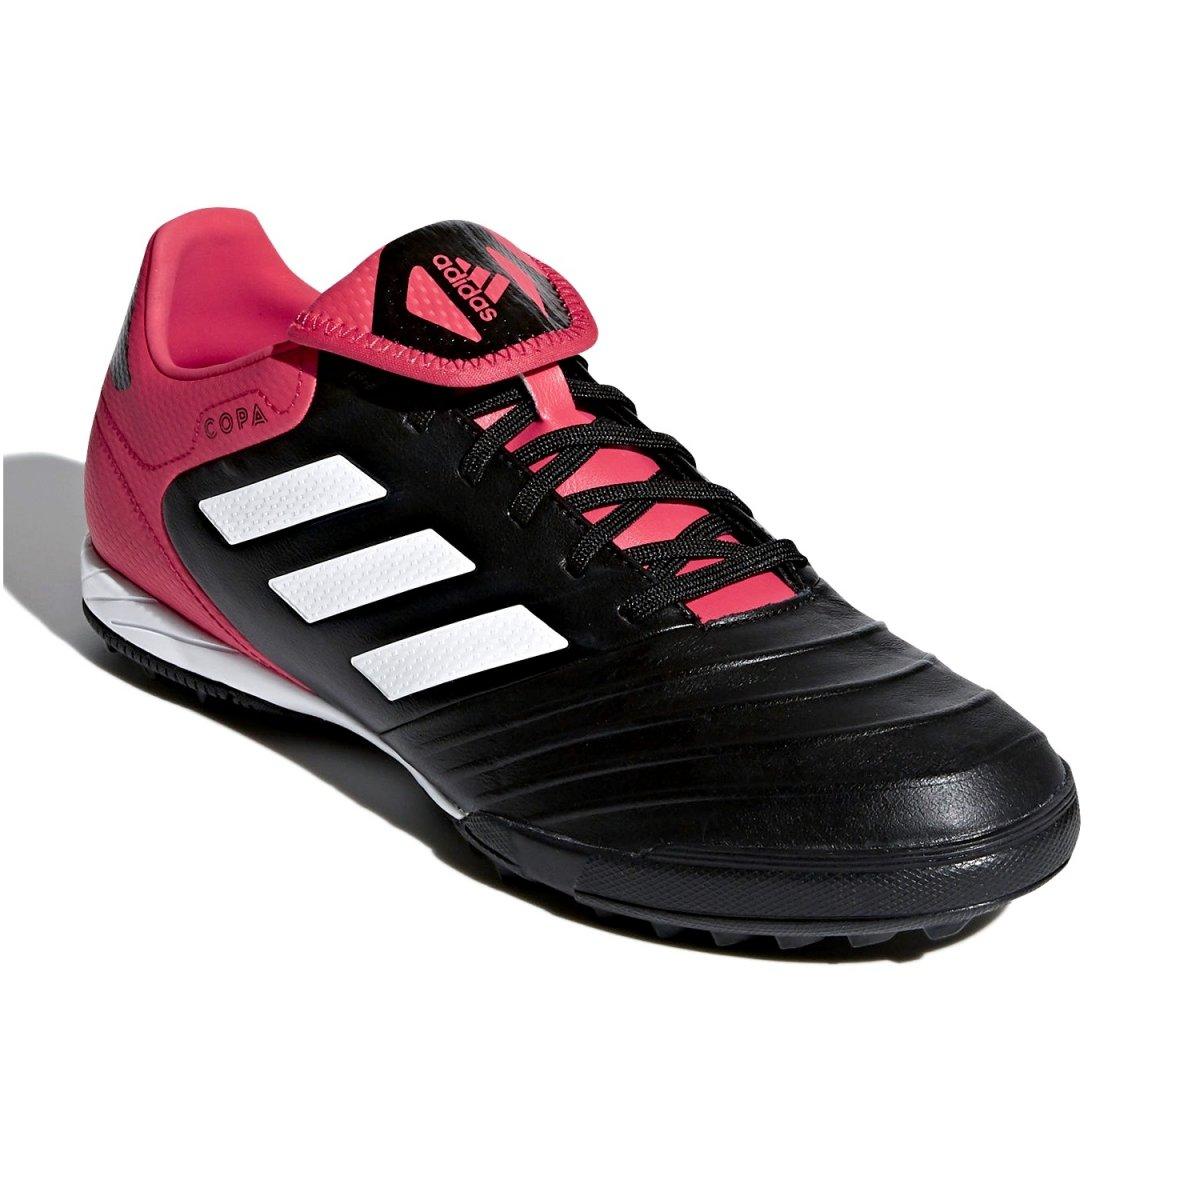 b9b28fdecd Chuteira Society Adidas Copa Tango 18.3 TF CP9022 - Preto Coral ...